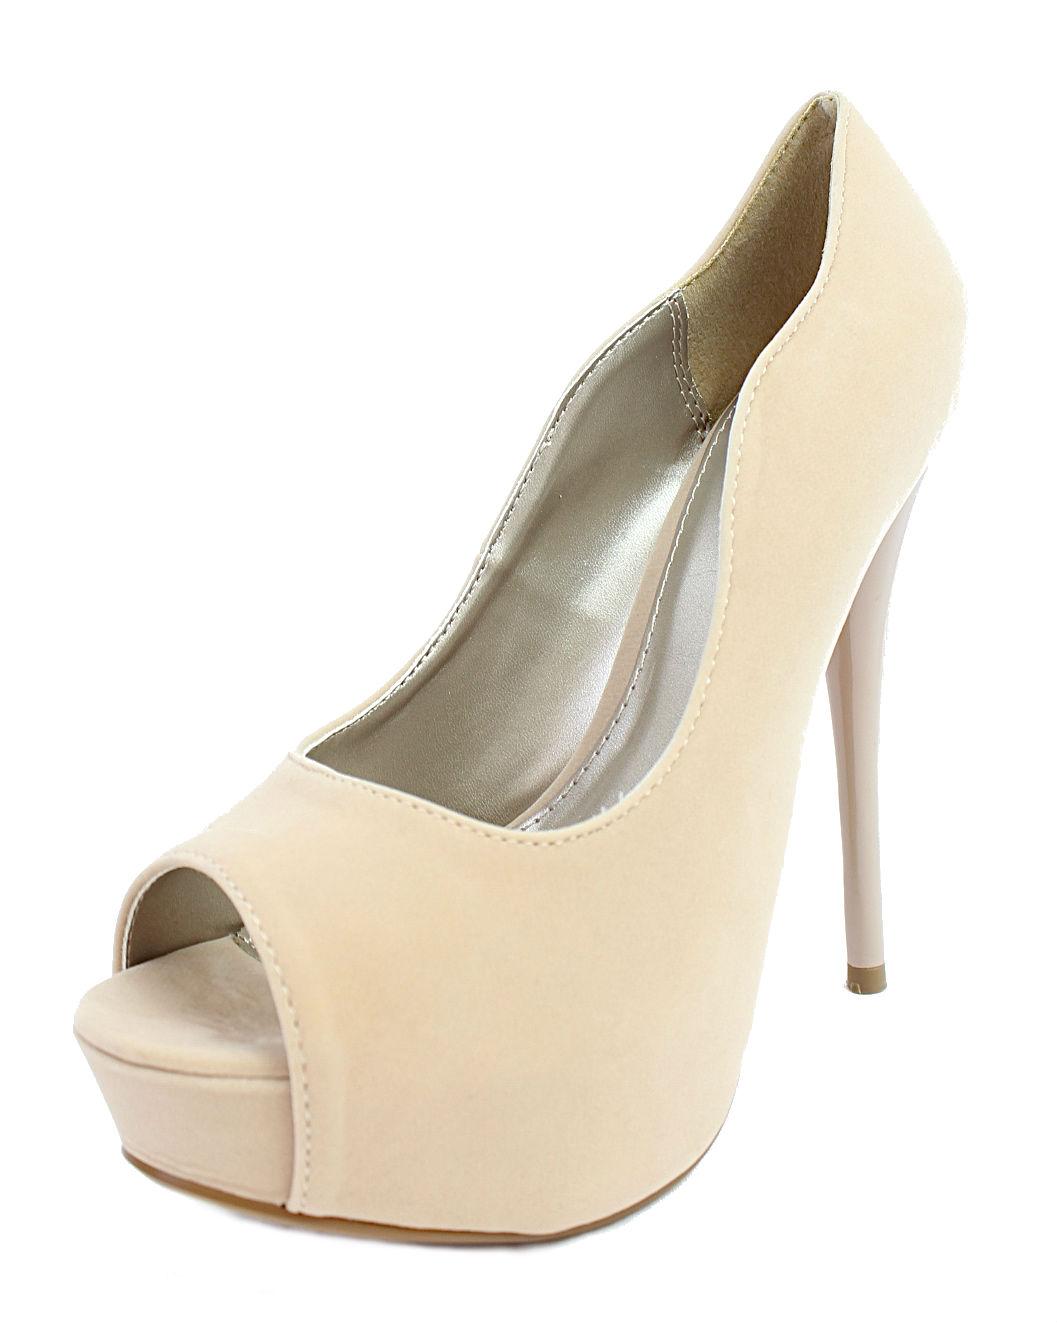 Qupid Neutral-35 Nude Velvet Platform High heels open toe Pumps-706